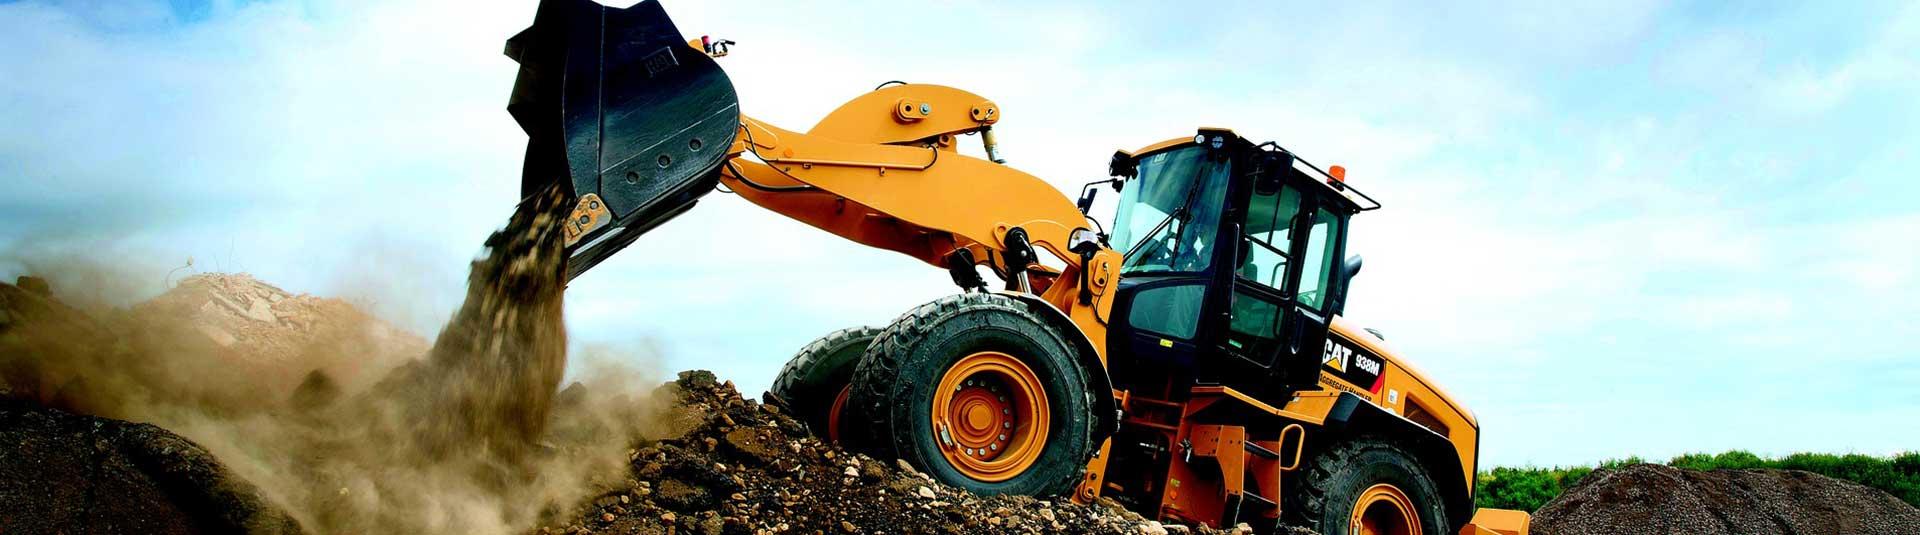 construction hero | TISCA | Tractor Implement Supply Company of Australia